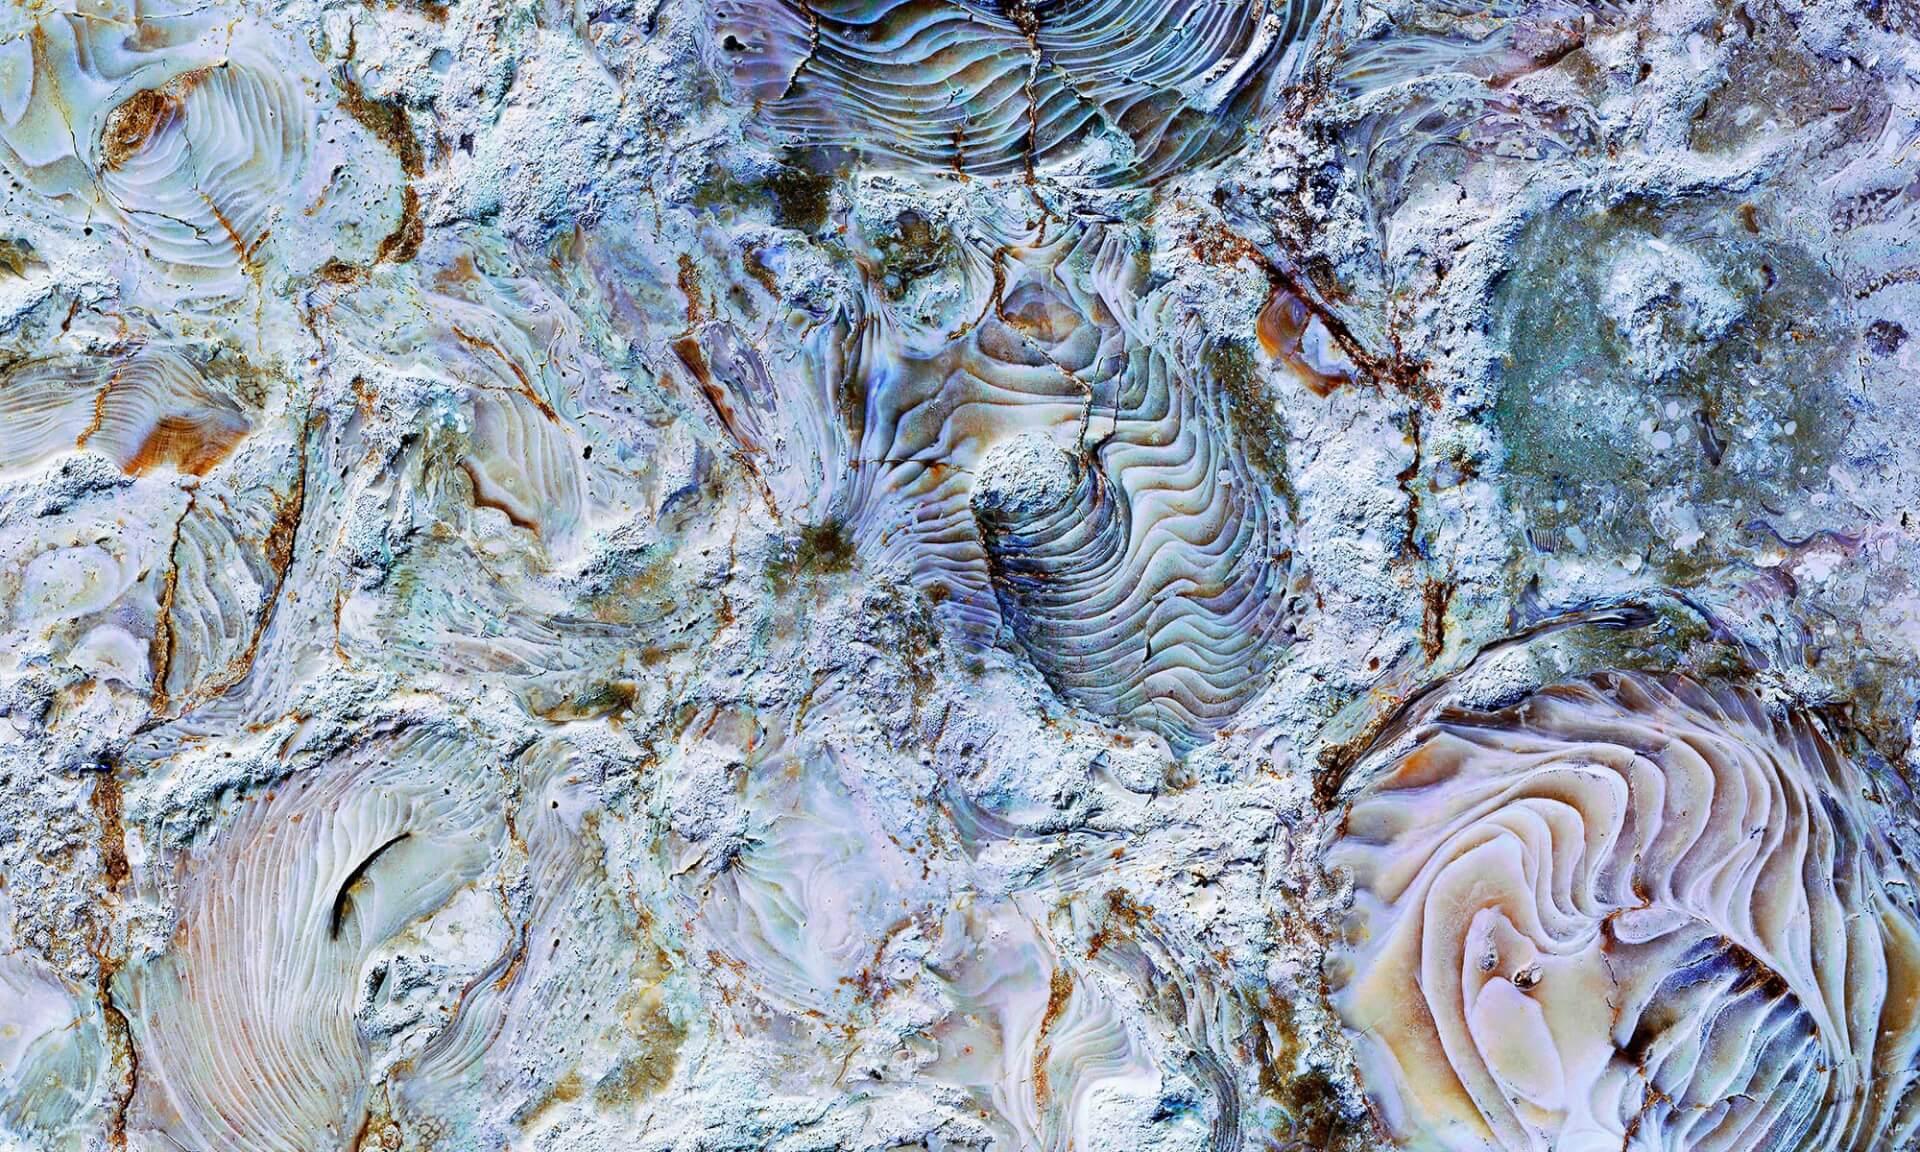 Coral Stone 4 Doug Garrabrants